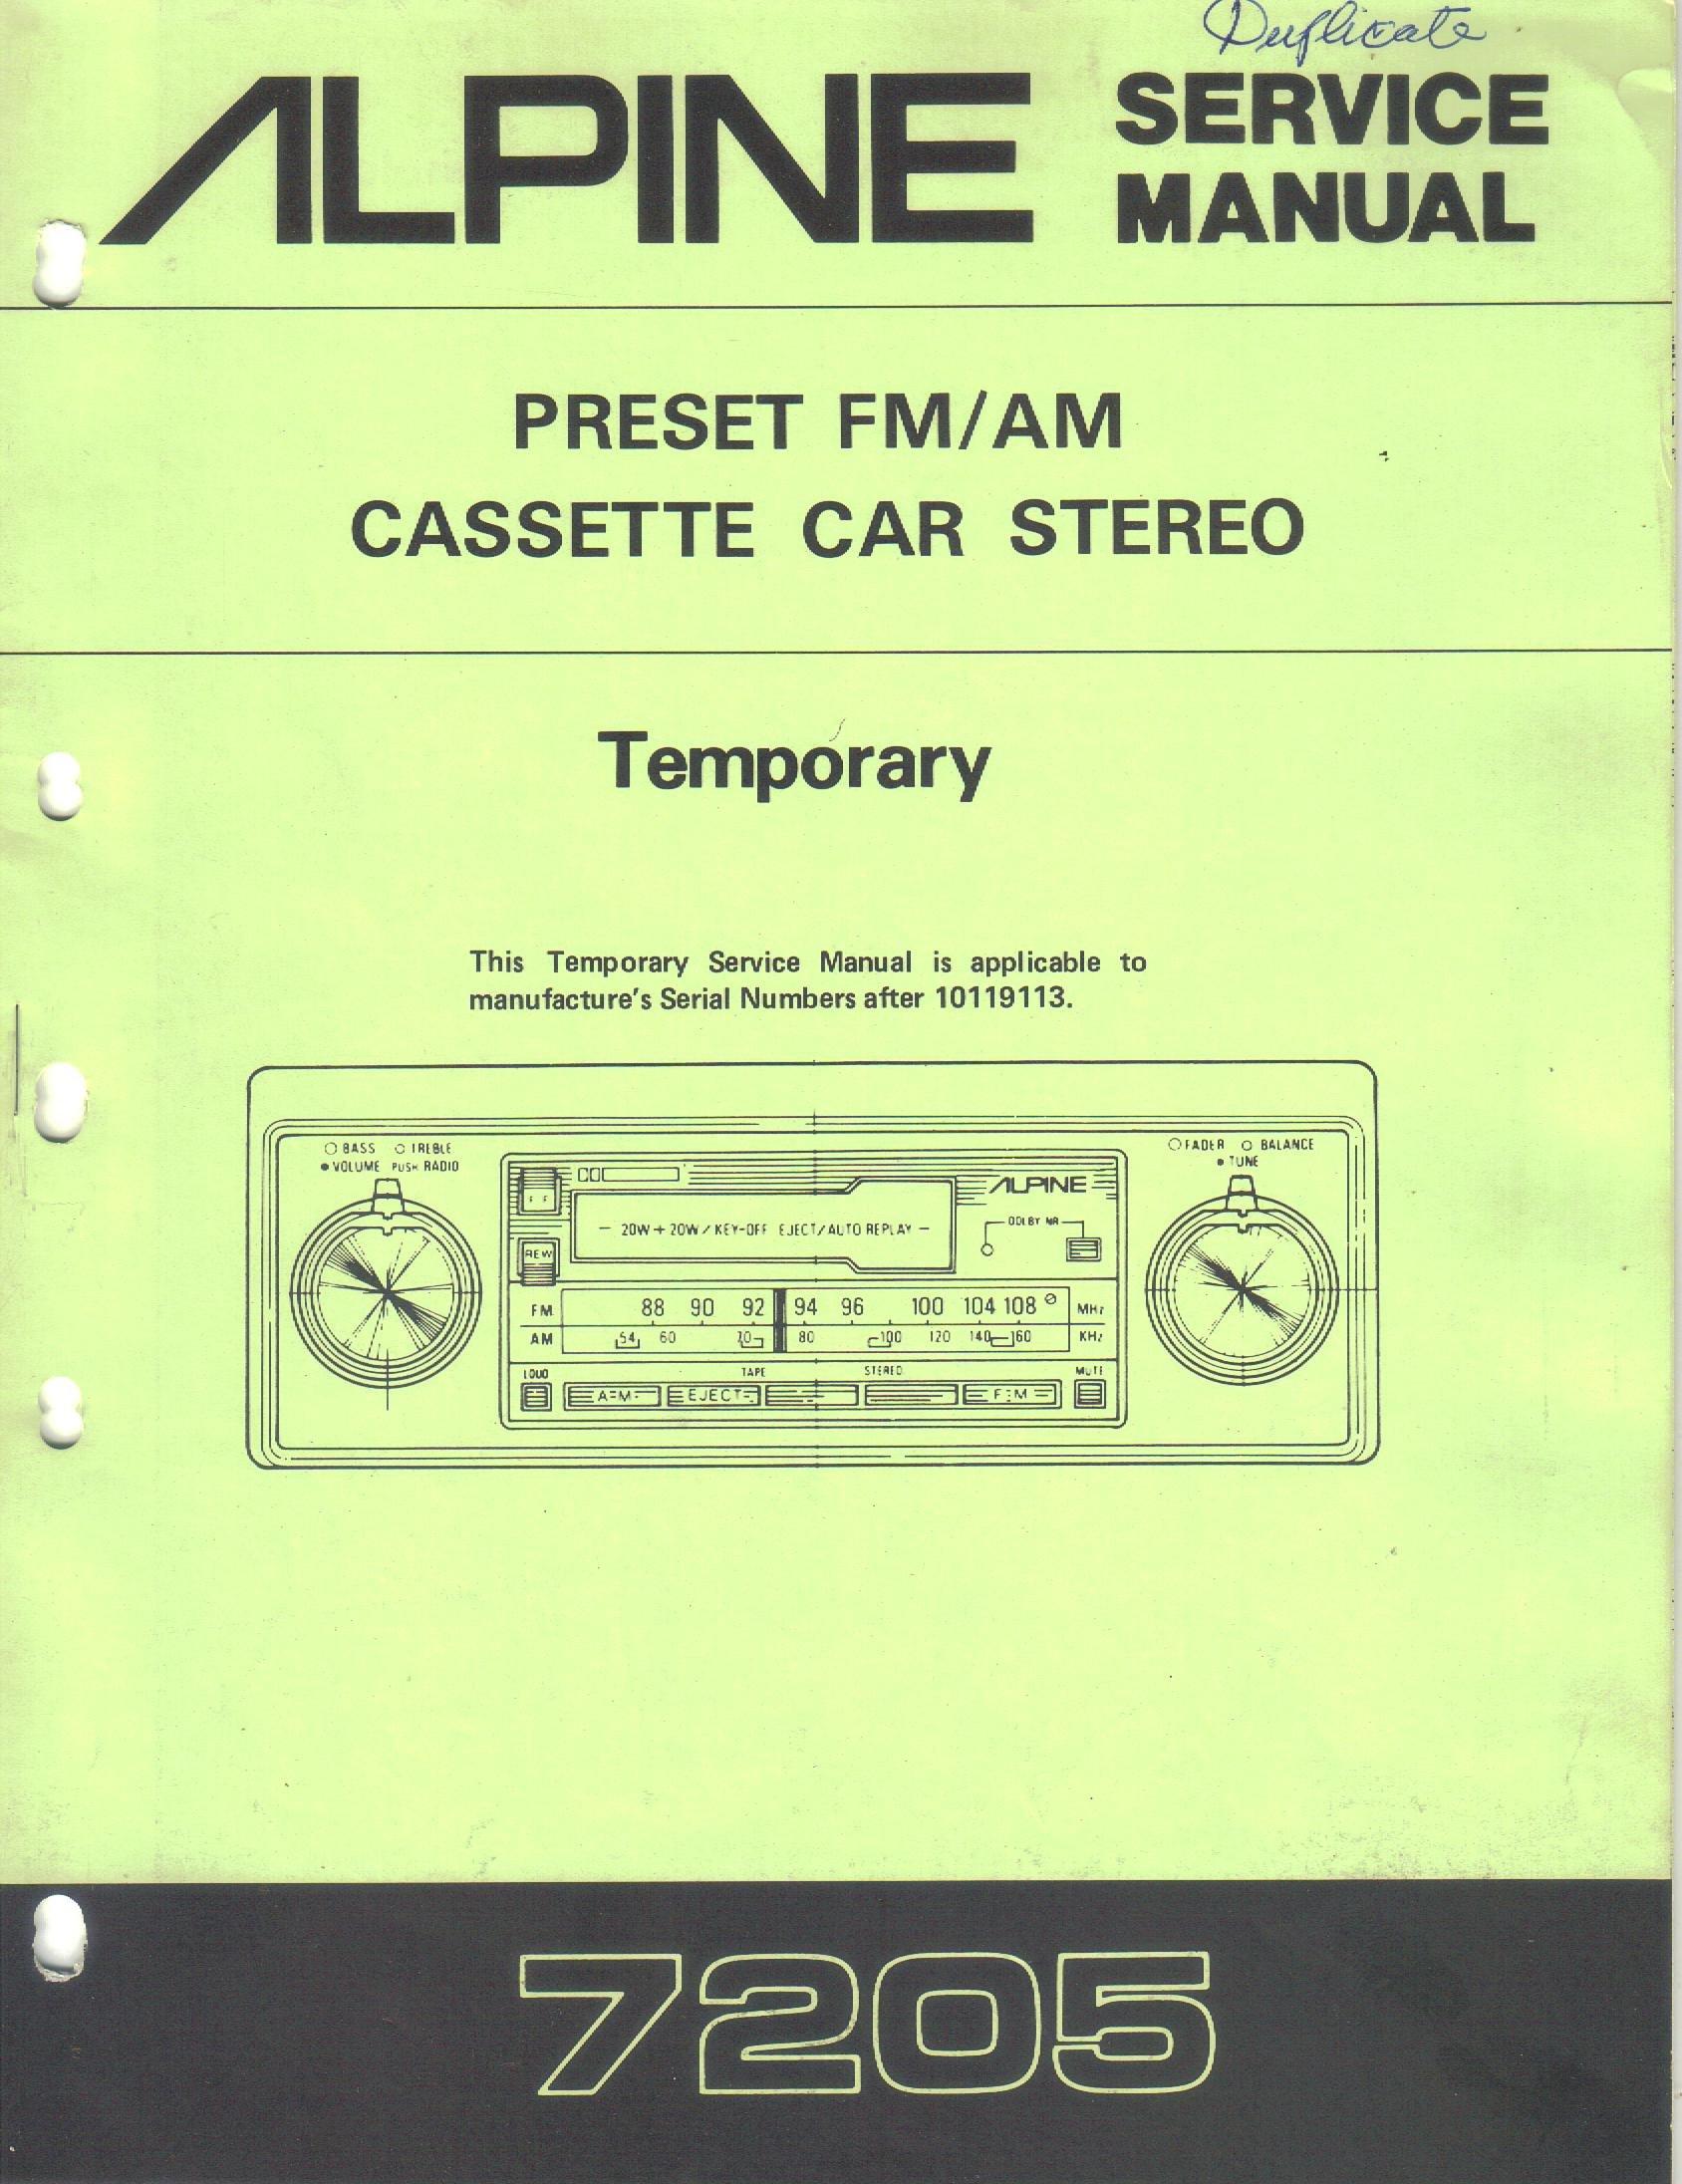 [DIAGRAM_38ZD]  Alpine 7205 Preset AM FM Cassette Car Stereo, Temporary Service Manual,  Parts List, Schematic Wiring Diagram: Alpine Electronics Inc, not stated:  Amazon.com: Books | Alpine Car Radio Wiring Diagram |  | Amazon.com